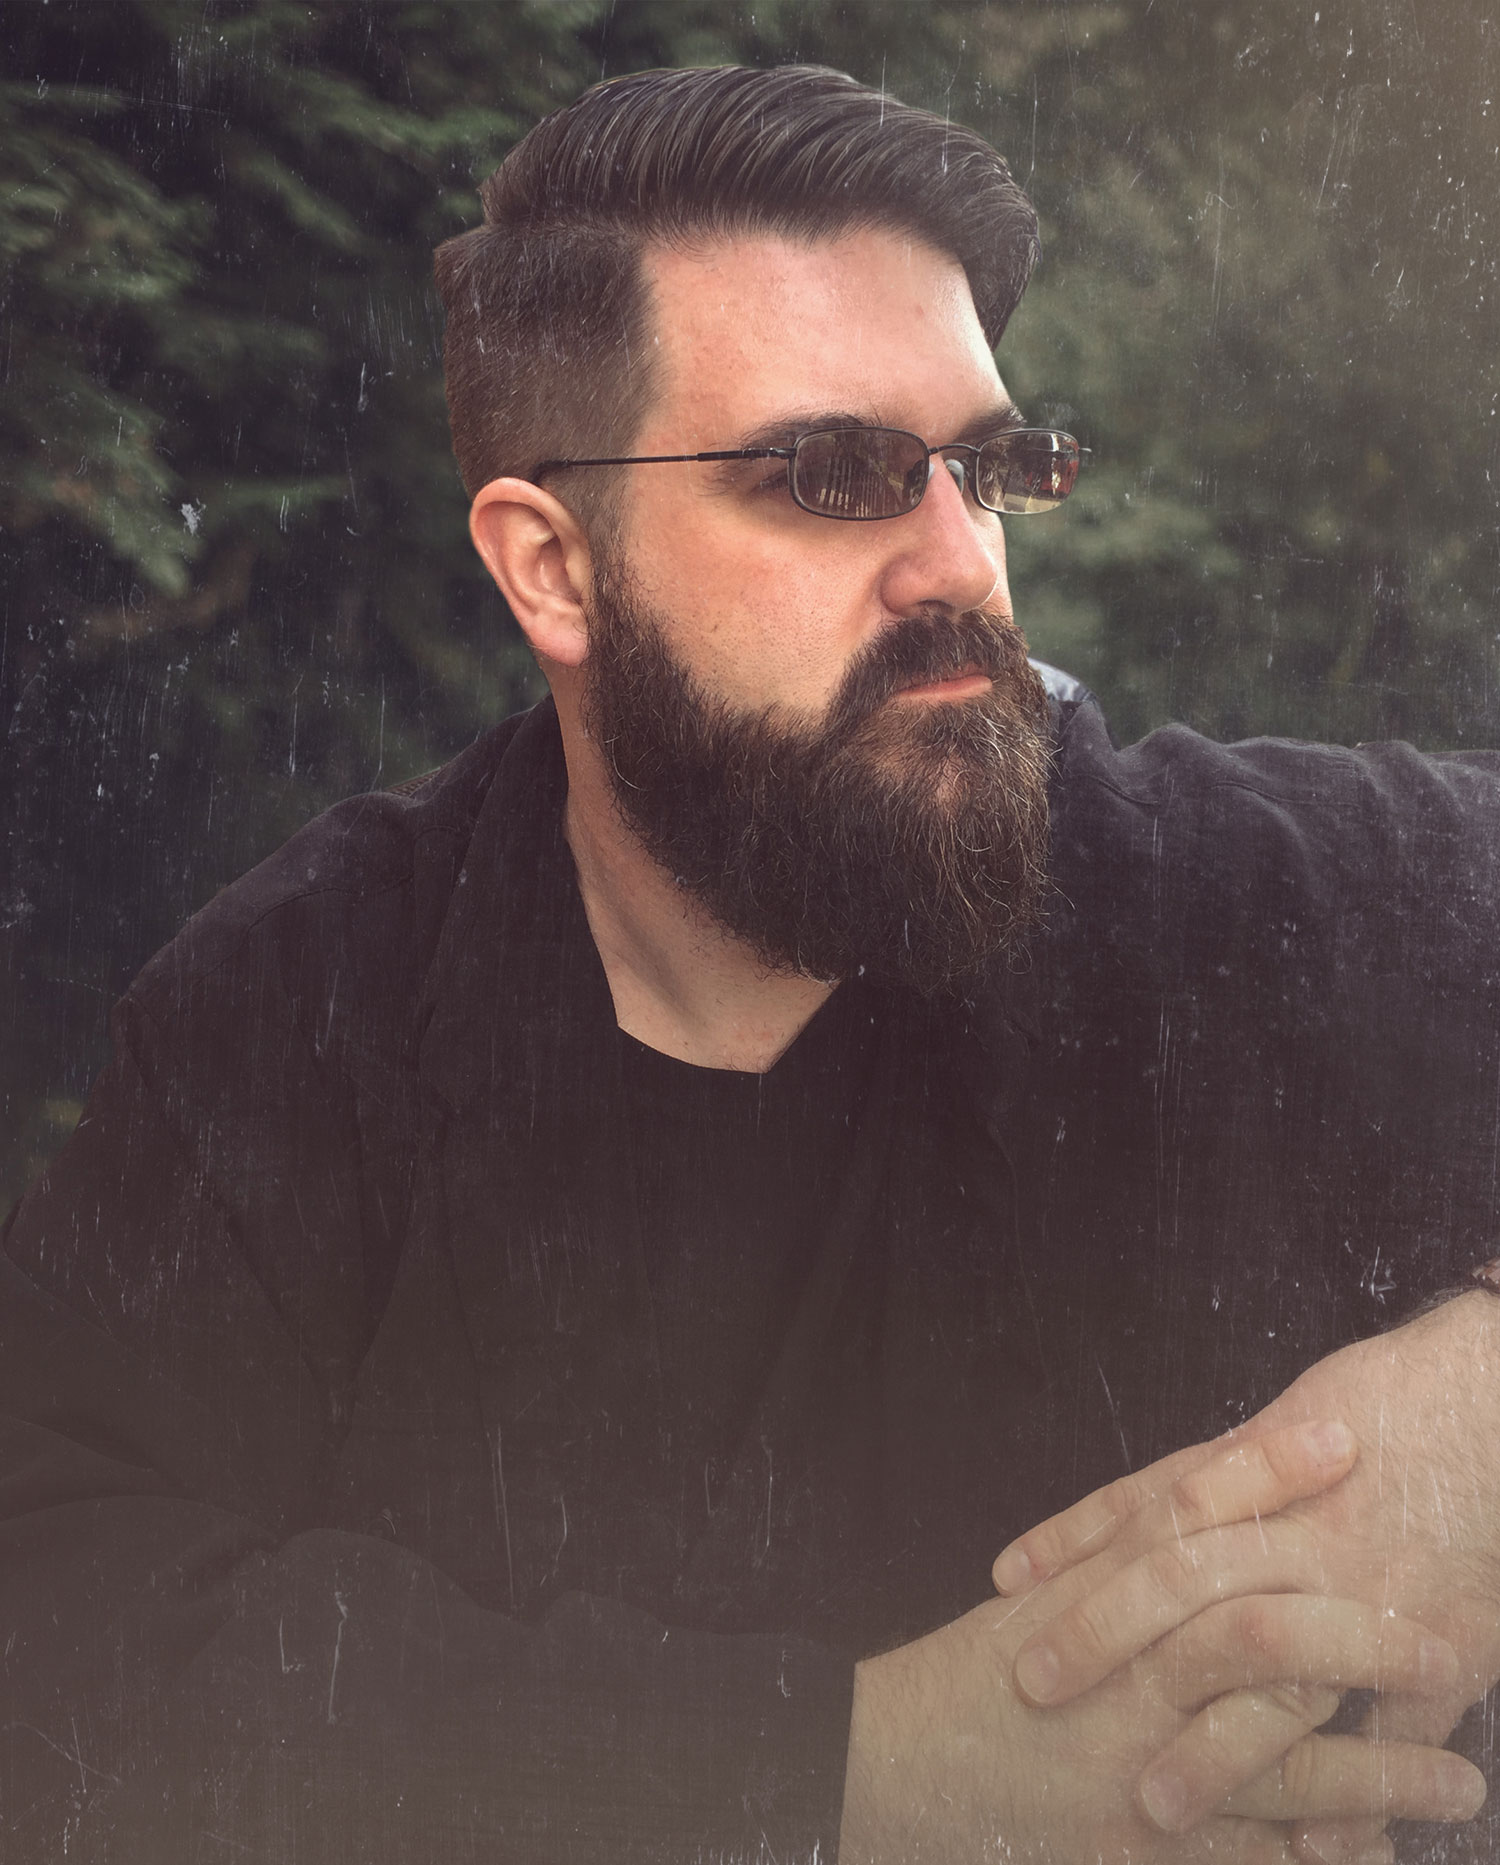 Steve-Profile-Pic.jpg